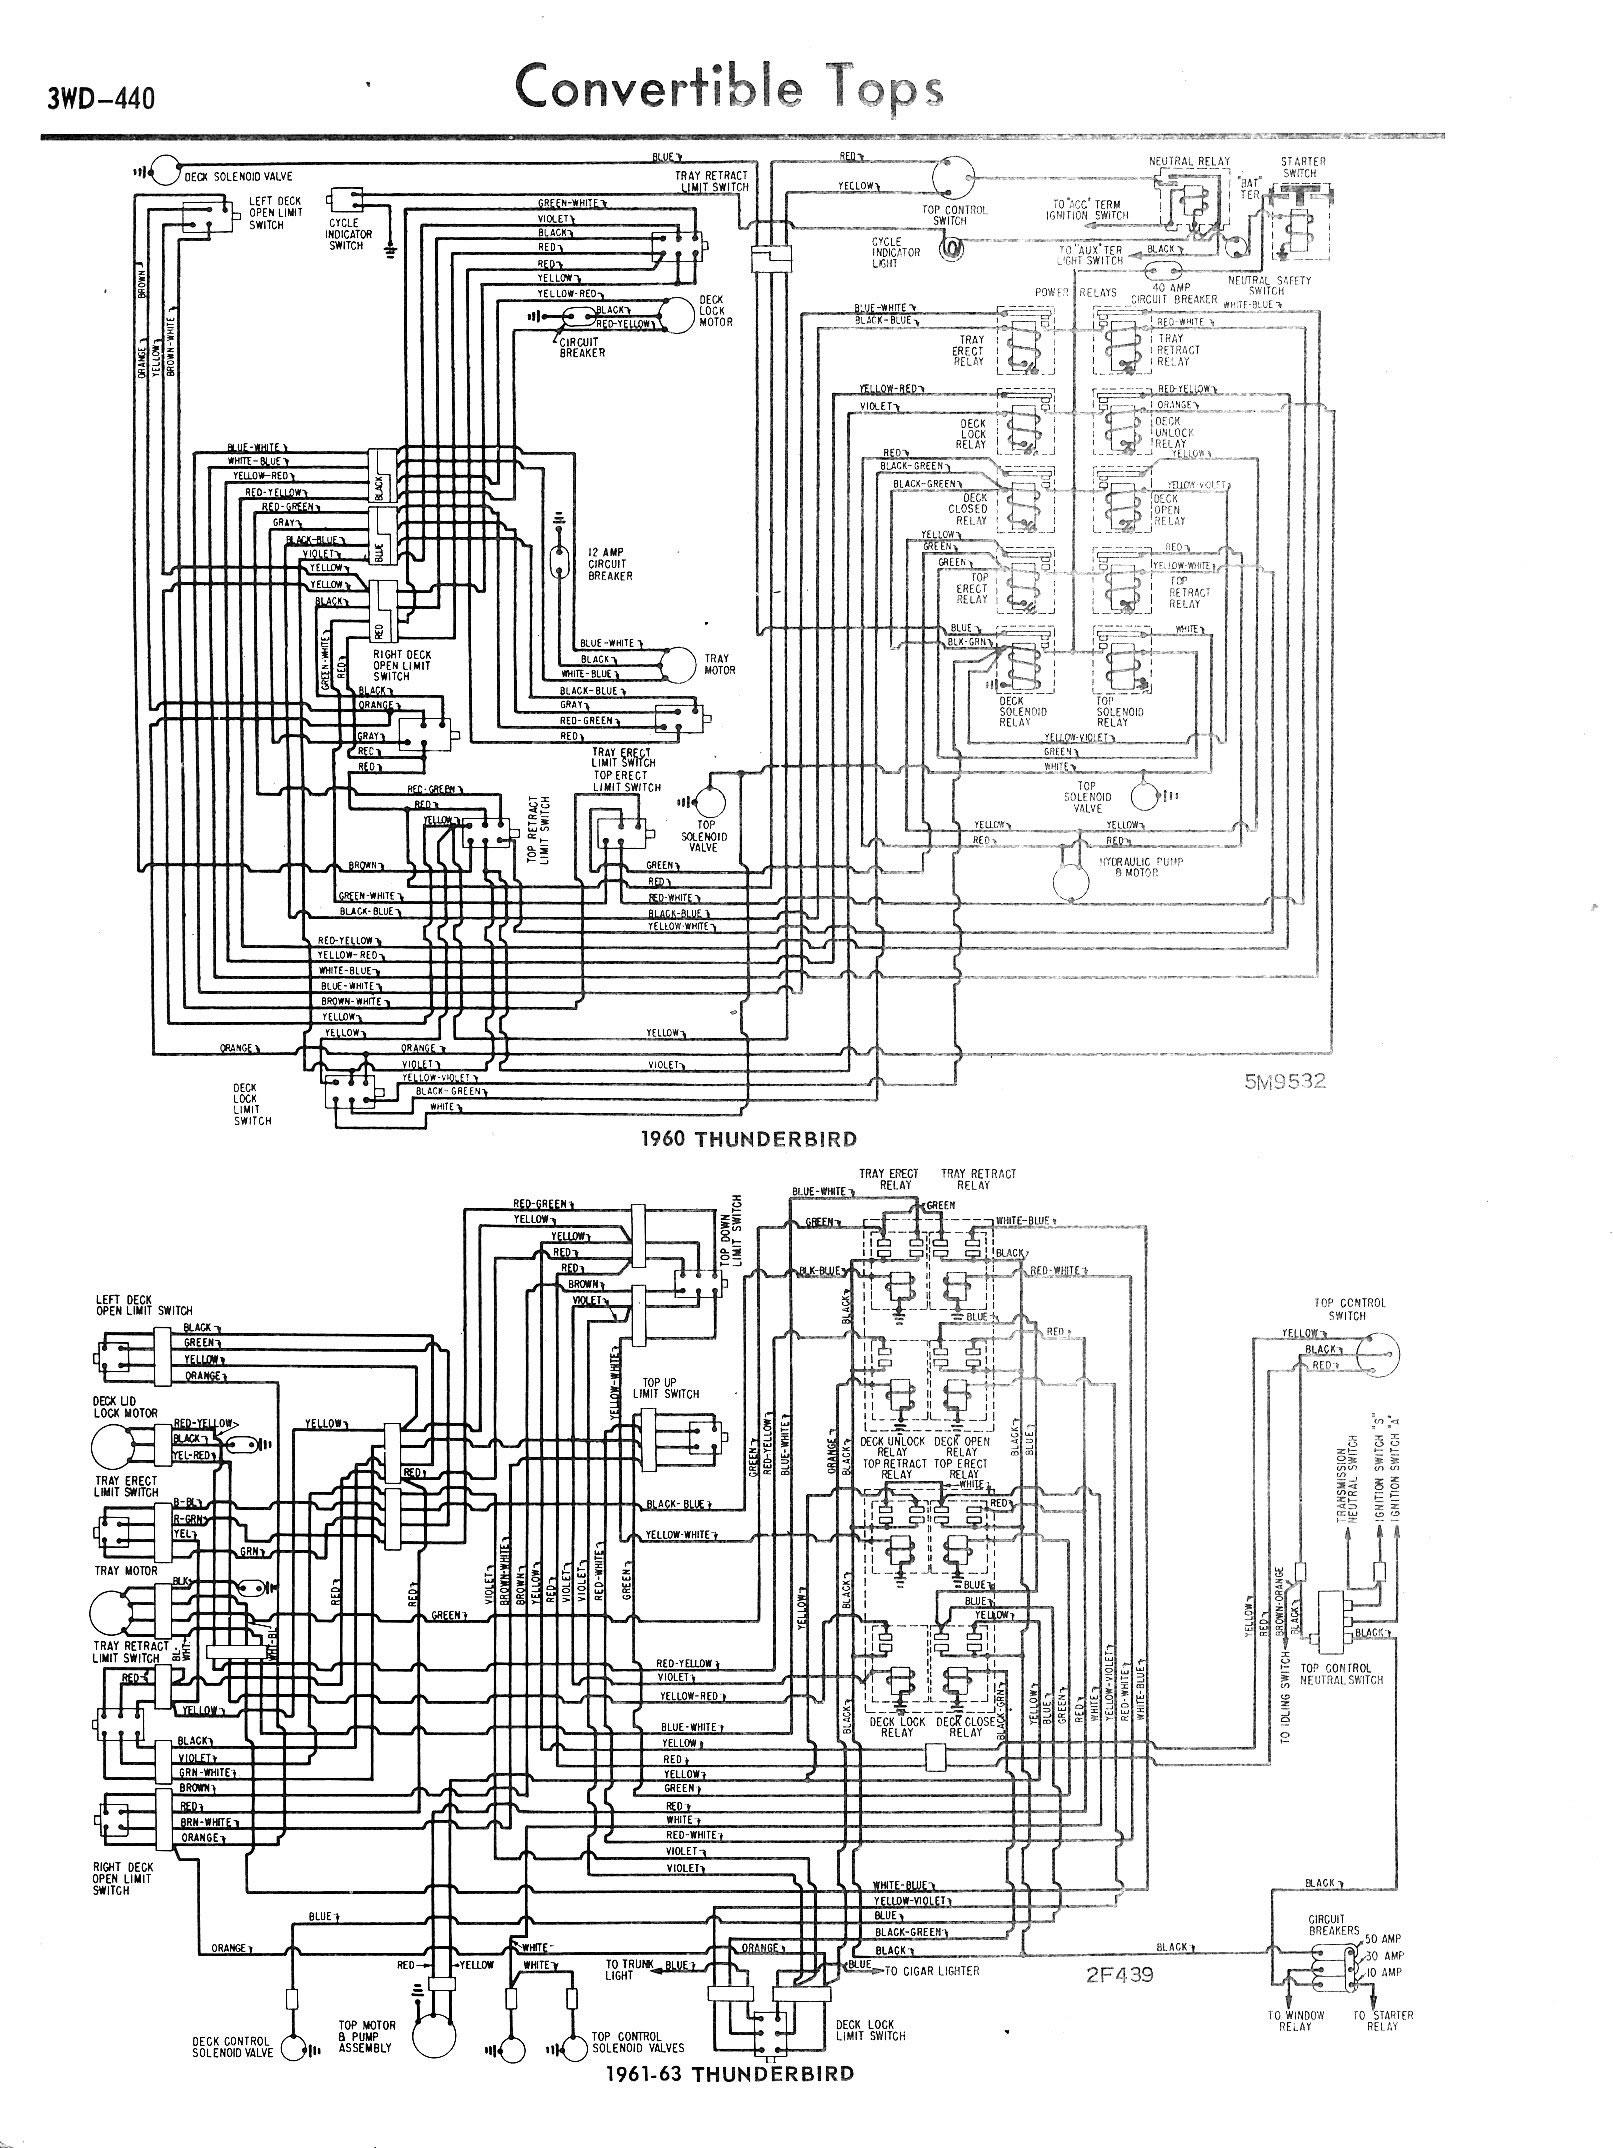 SM_7597] Convertible Tops Wiring Diagram Of 1960 Ford Thunderbird Schematic  WiringLotap Omit Hyedi Mohammedshrine Librar Wiring 101